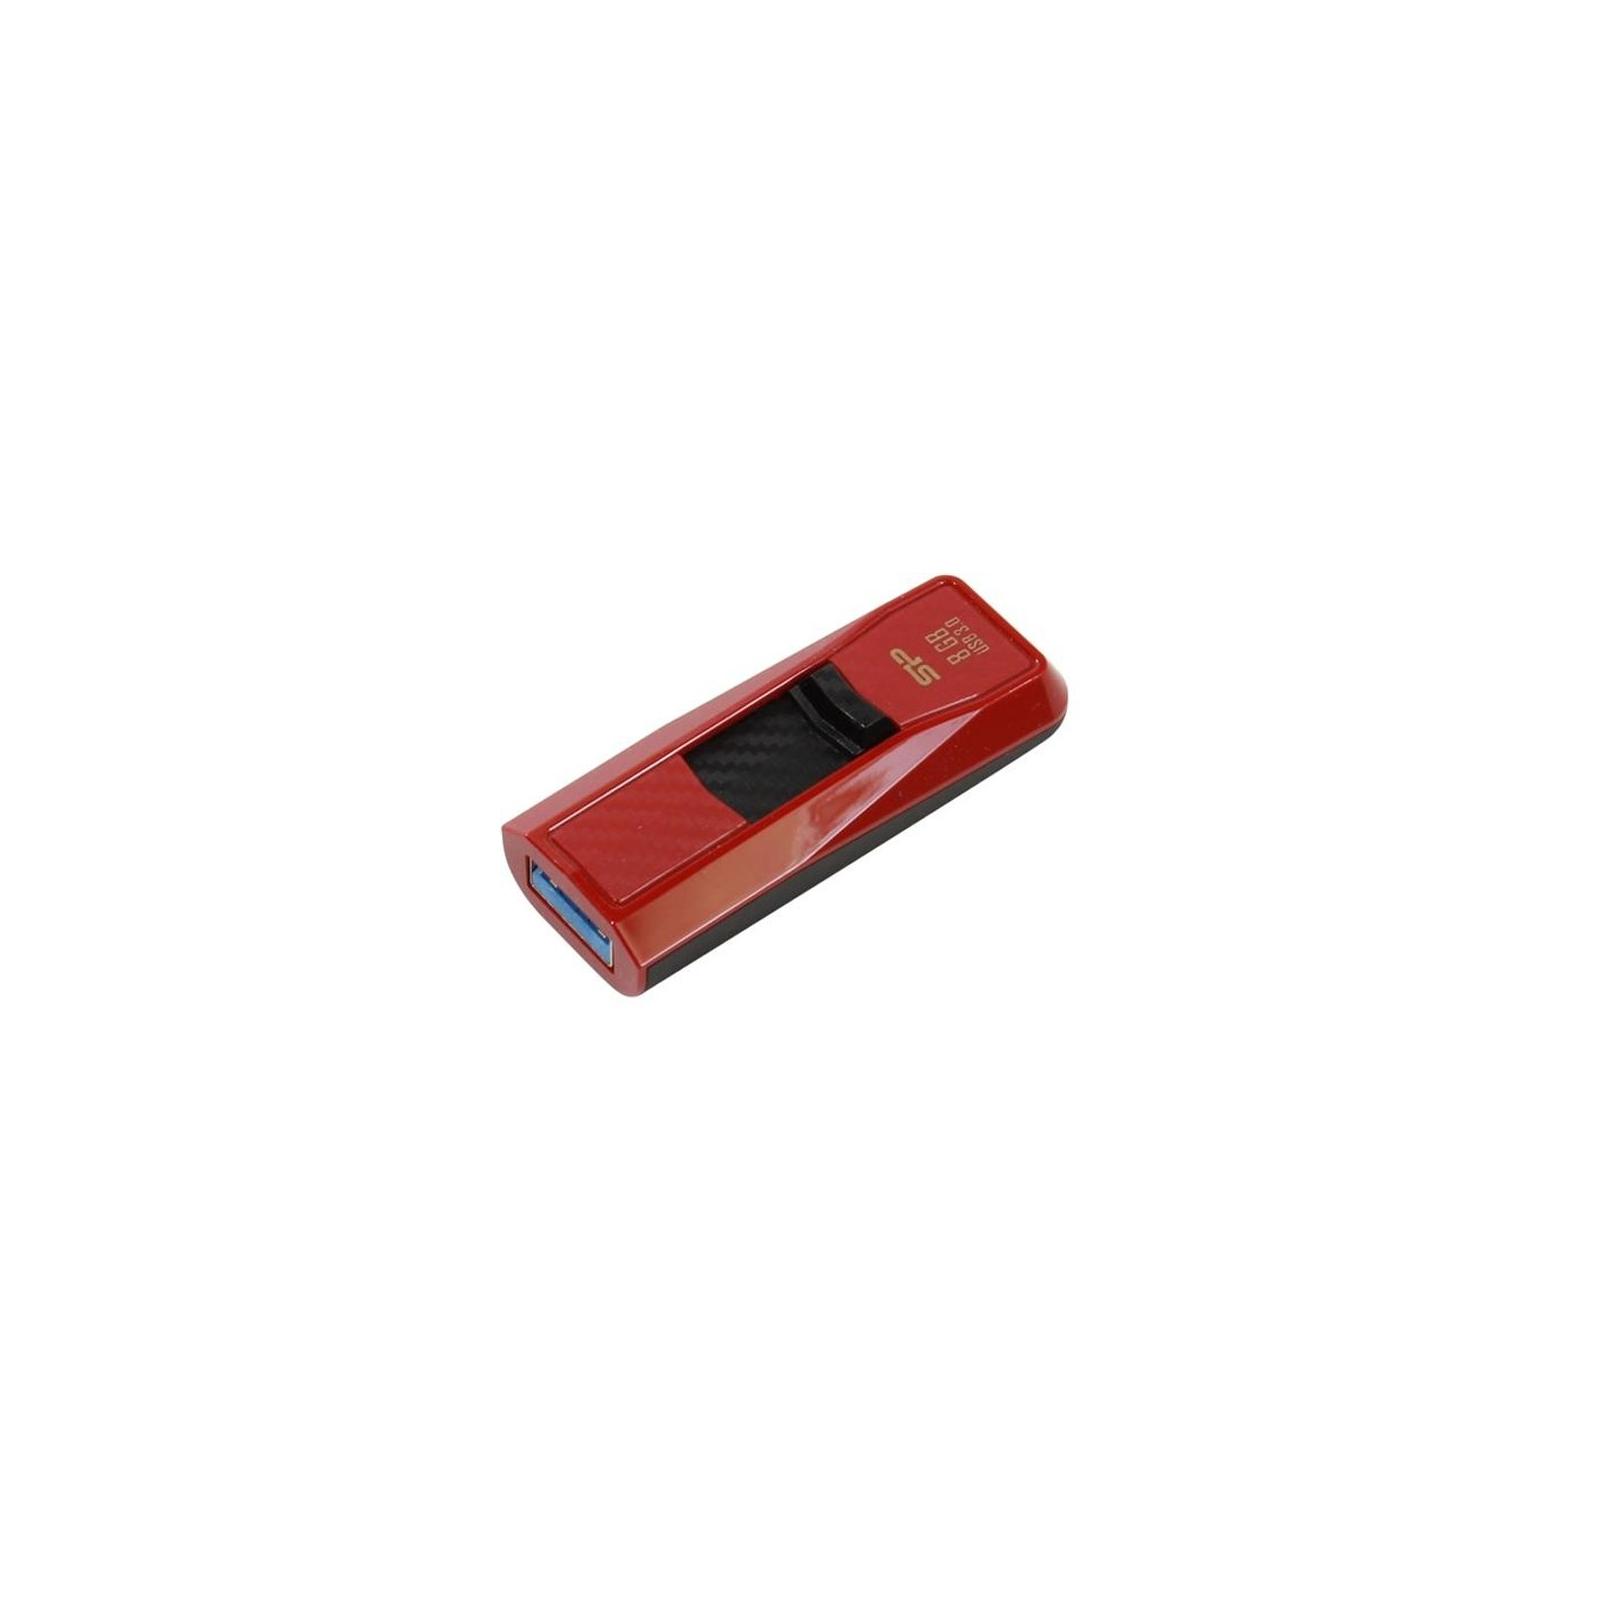 USB флеш накопитель Silicon Power 8GB B50 Black USB 3.0 (SP008GBUF3B50V1K) изображение 4